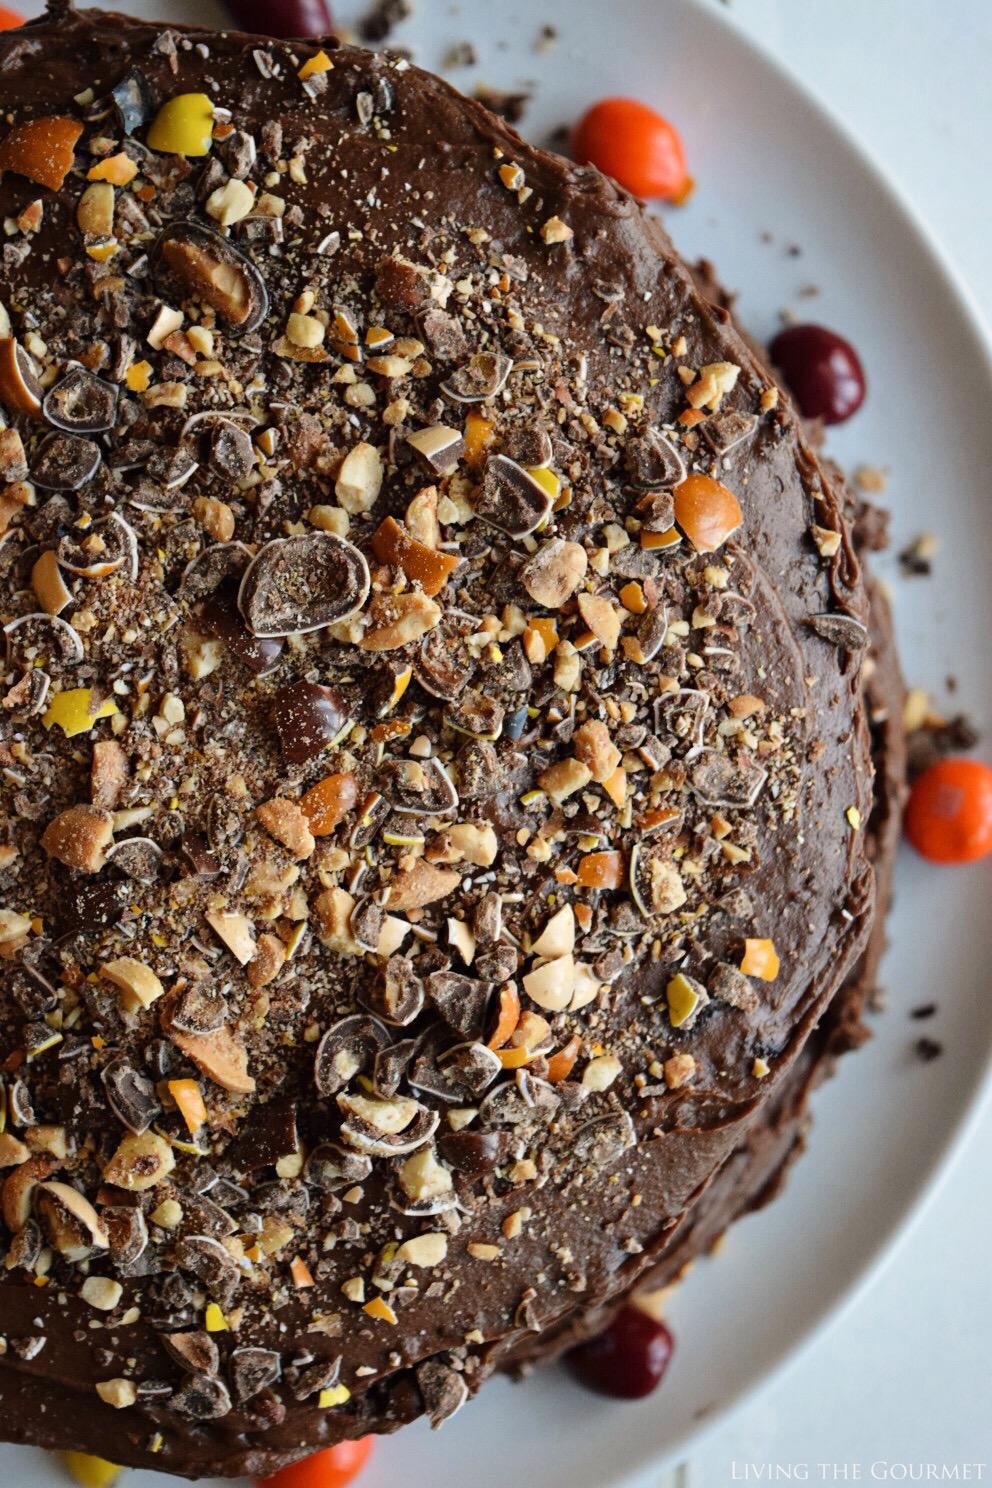 @livingthegourmet's cover photo for 'Coffee Nut Chocolate Cake - Living The Gourmet'